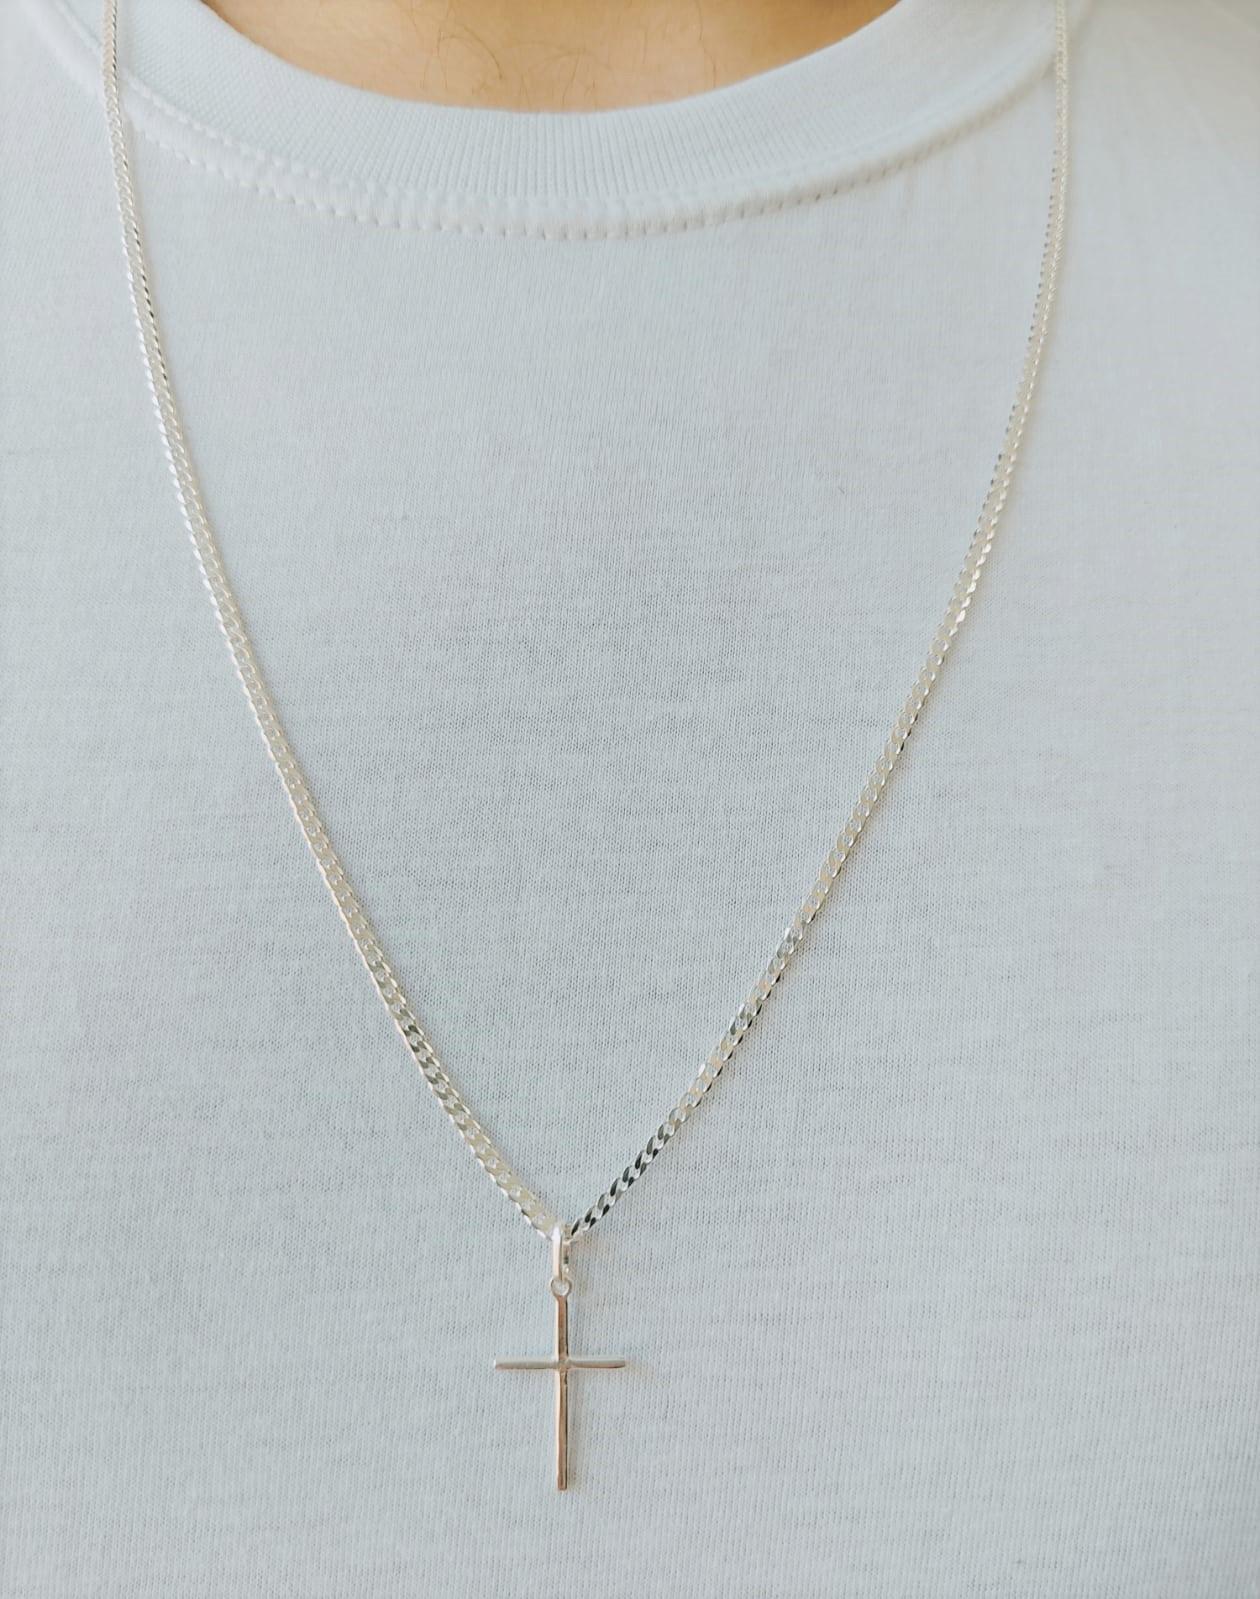 Cordão Corrente Masculina Grumet 60cm Pingente Crucifixo De Prata 925